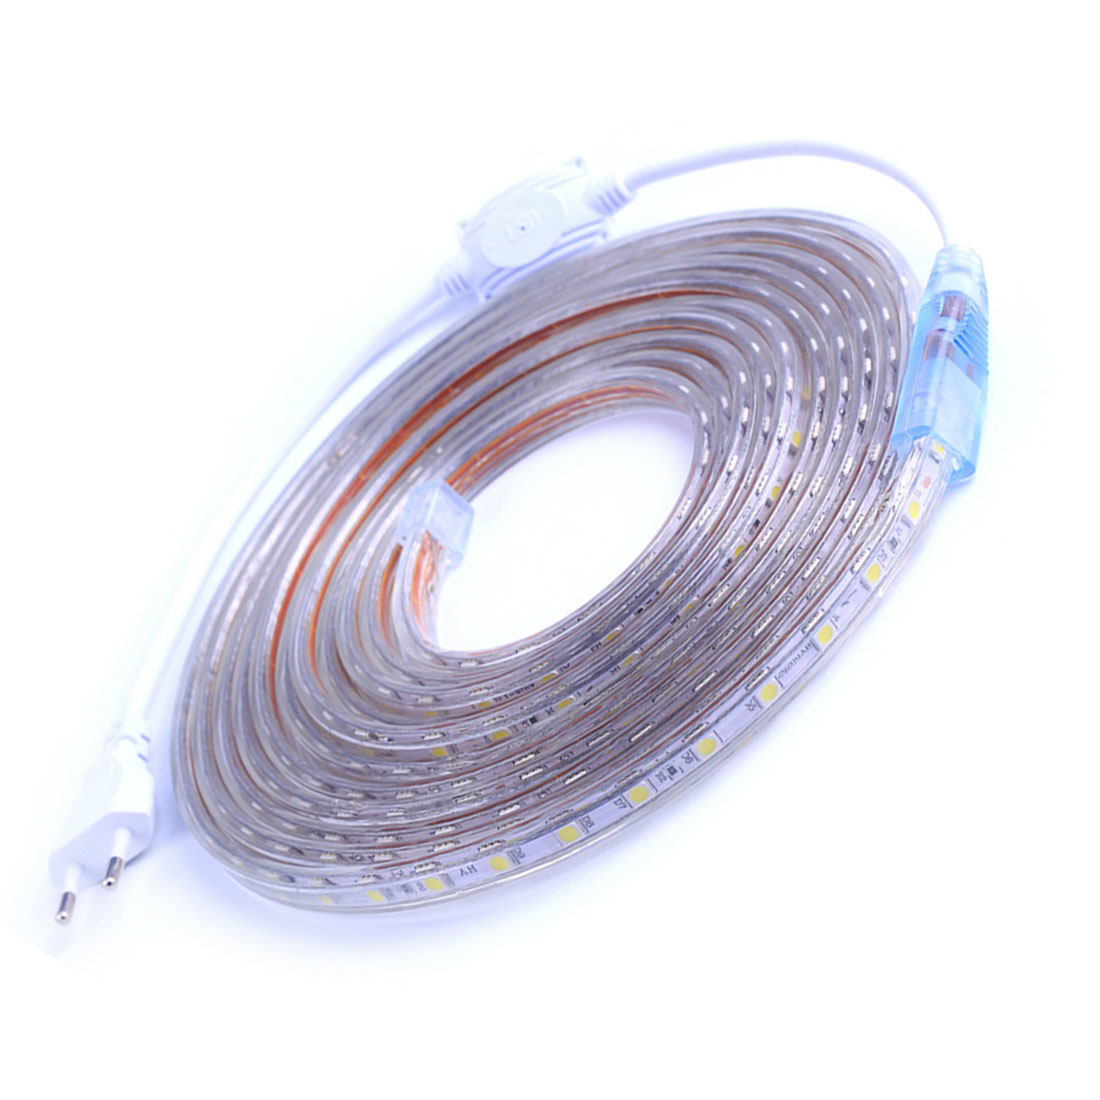 AC220V 60leds/m Waterproof Flexible LED Strip Light IP67 LED Tape LED Light With EU Power Plug